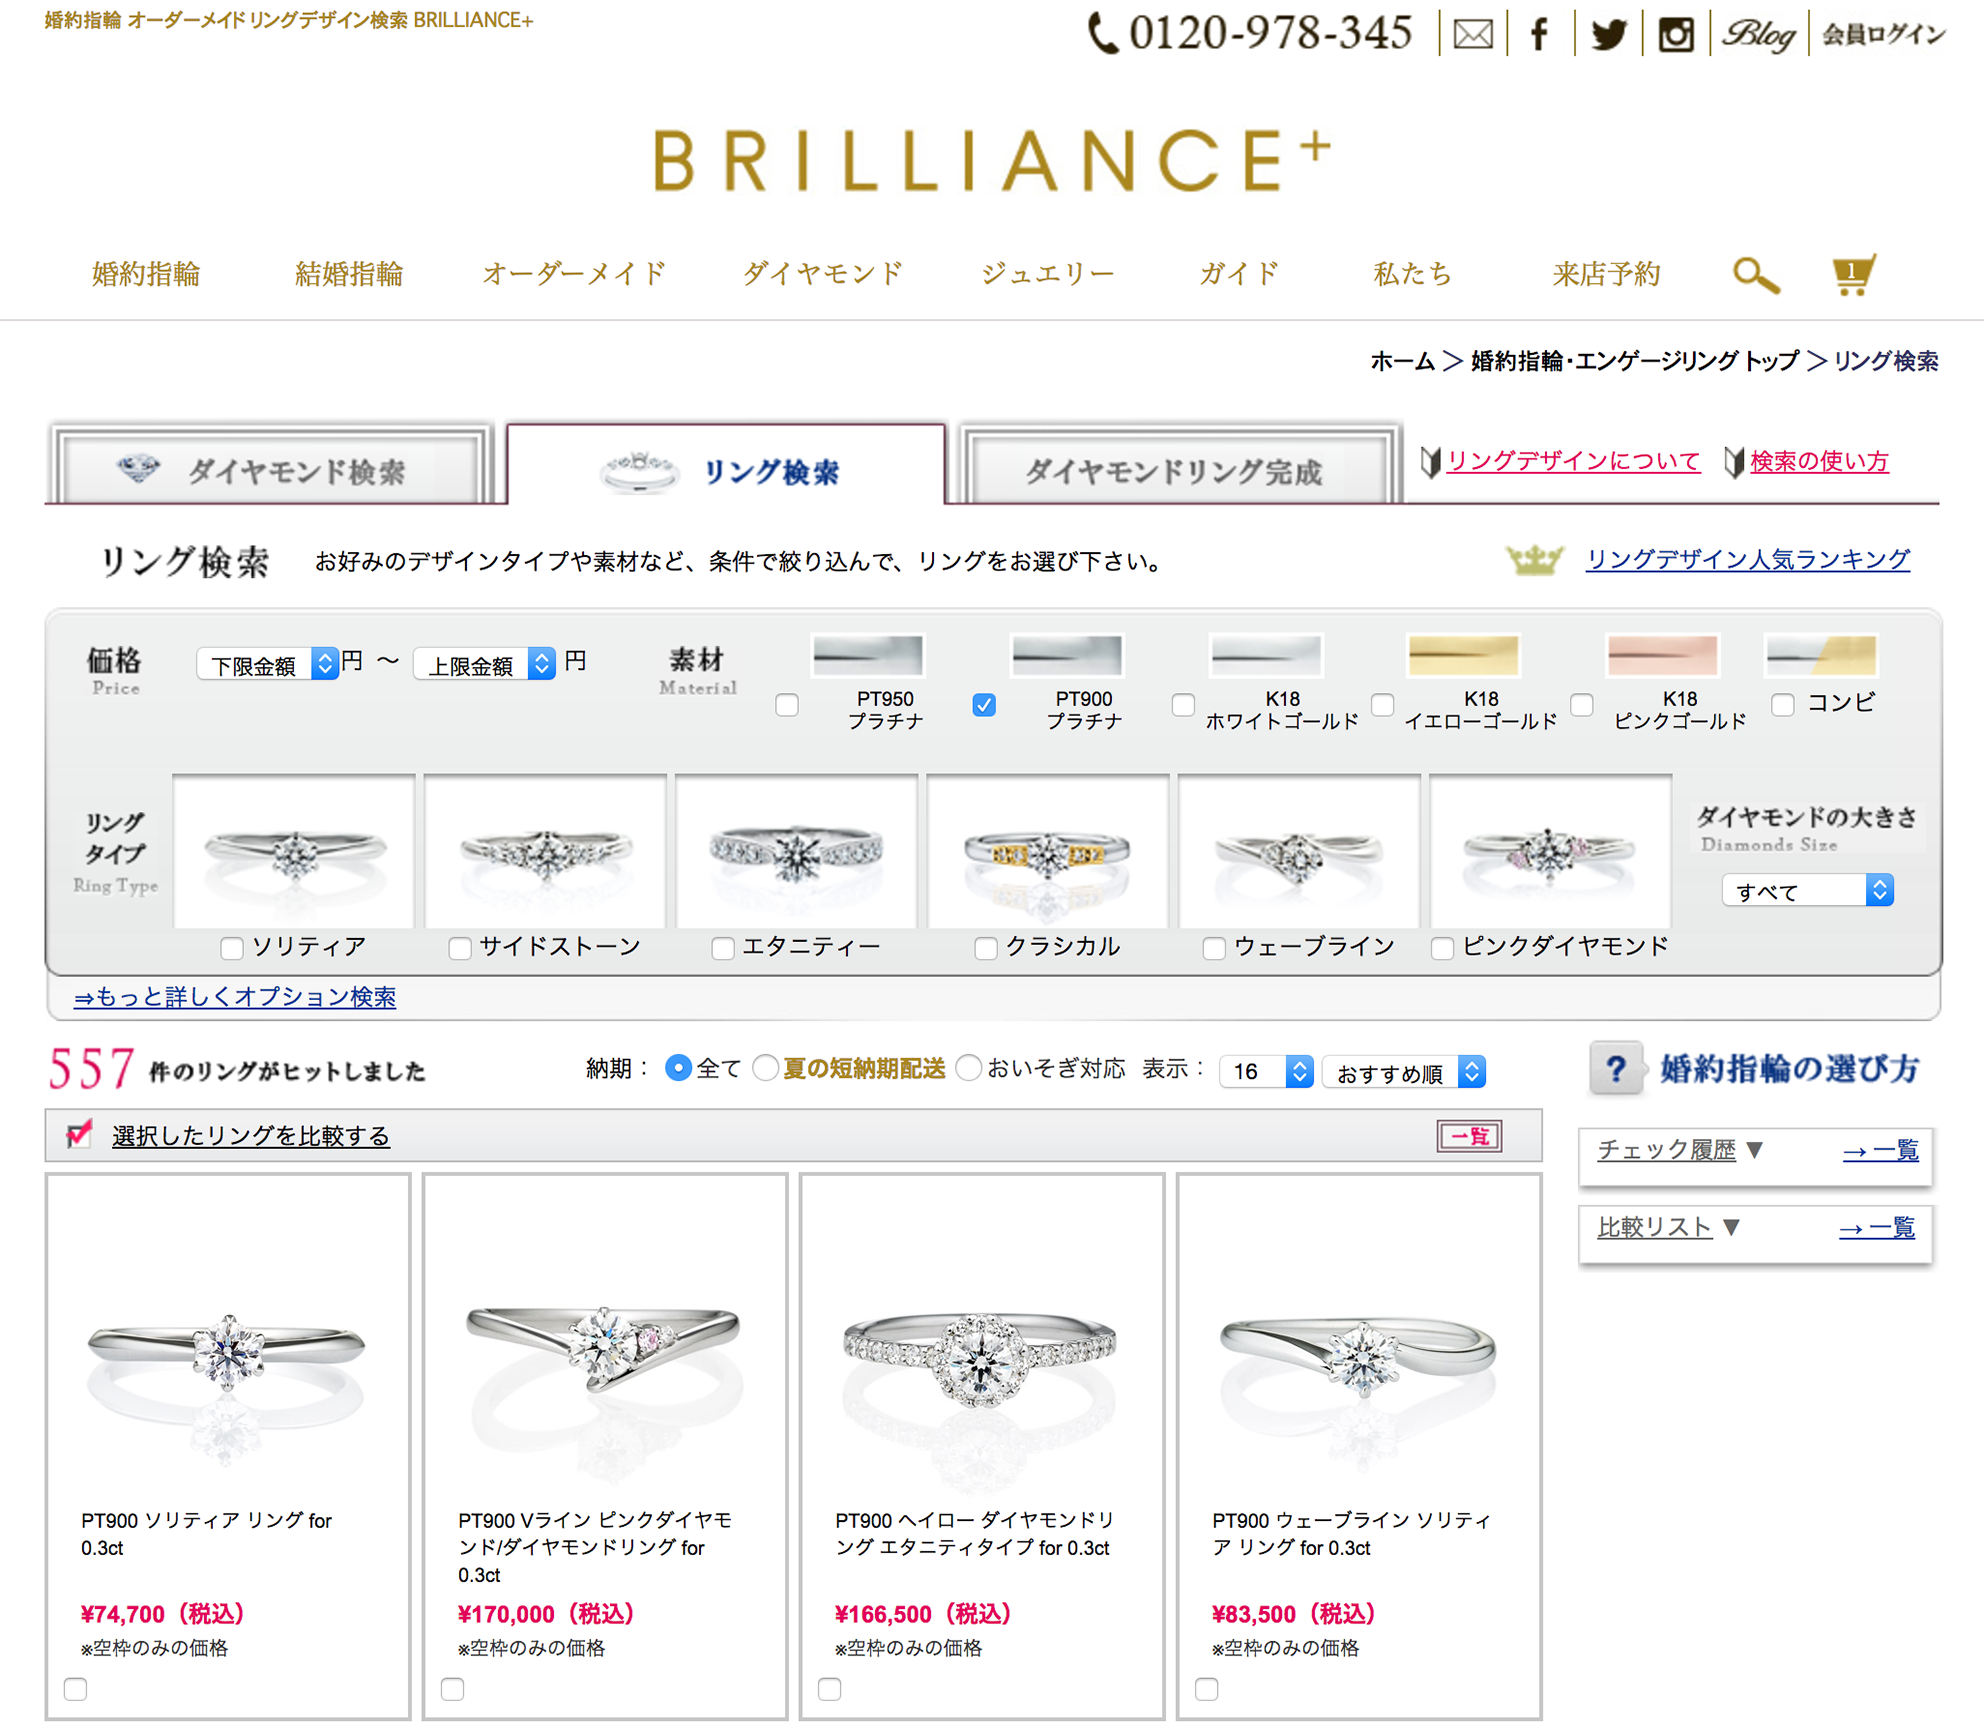 Brilliance+婚約指輪の注文